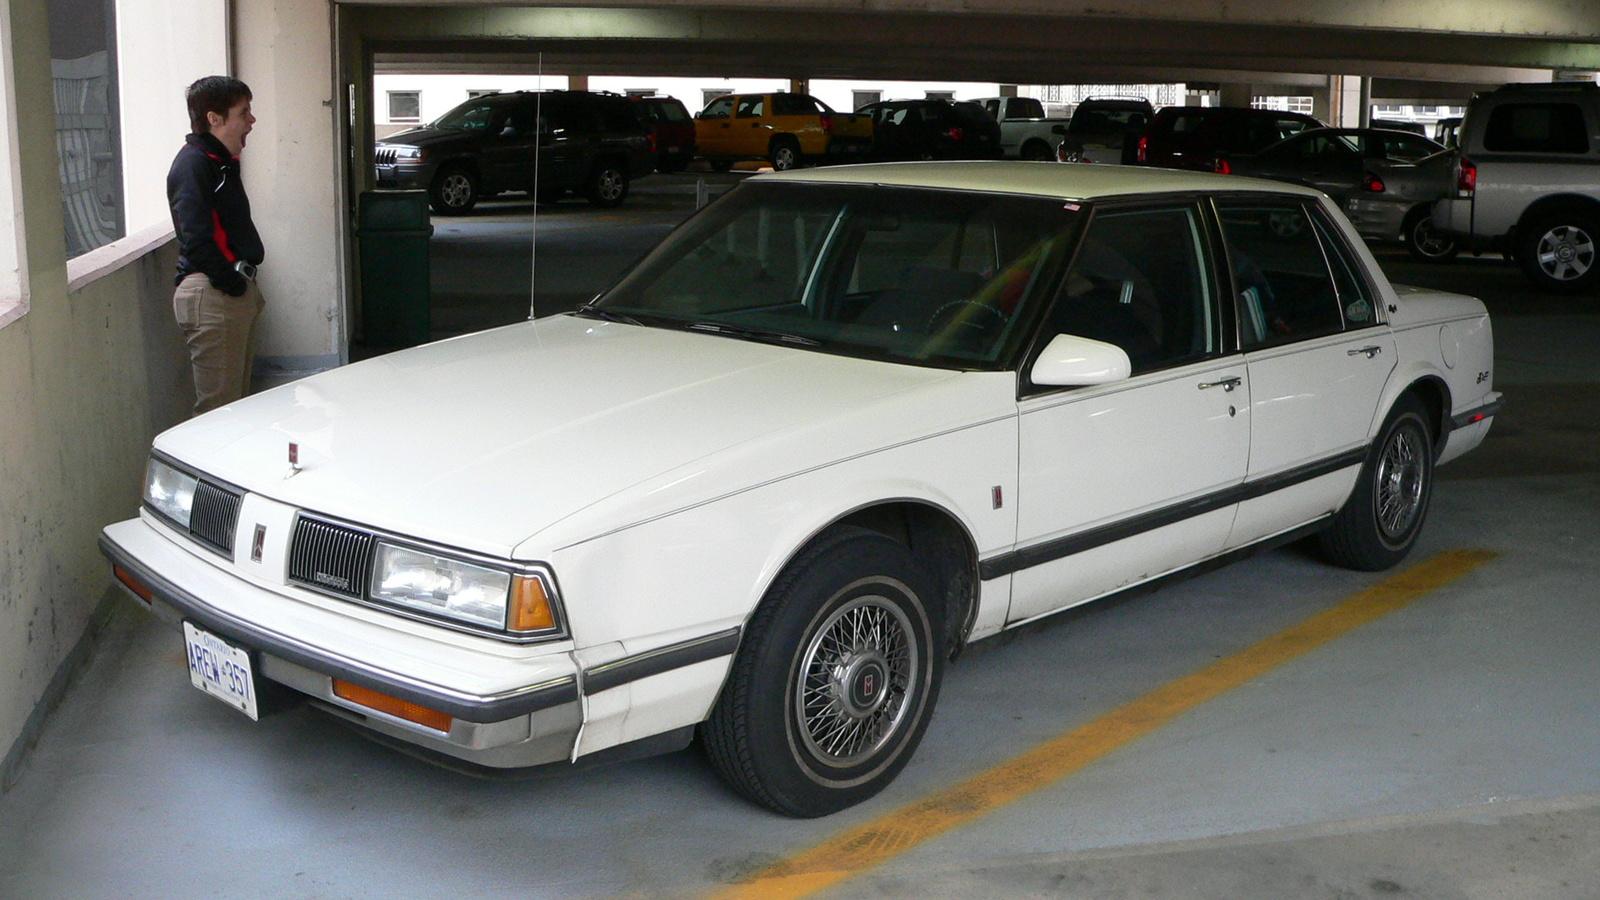 1989 Oldsmobile Eighty-Eight - Pictures - 1989 Oldsmobile Eighty ...